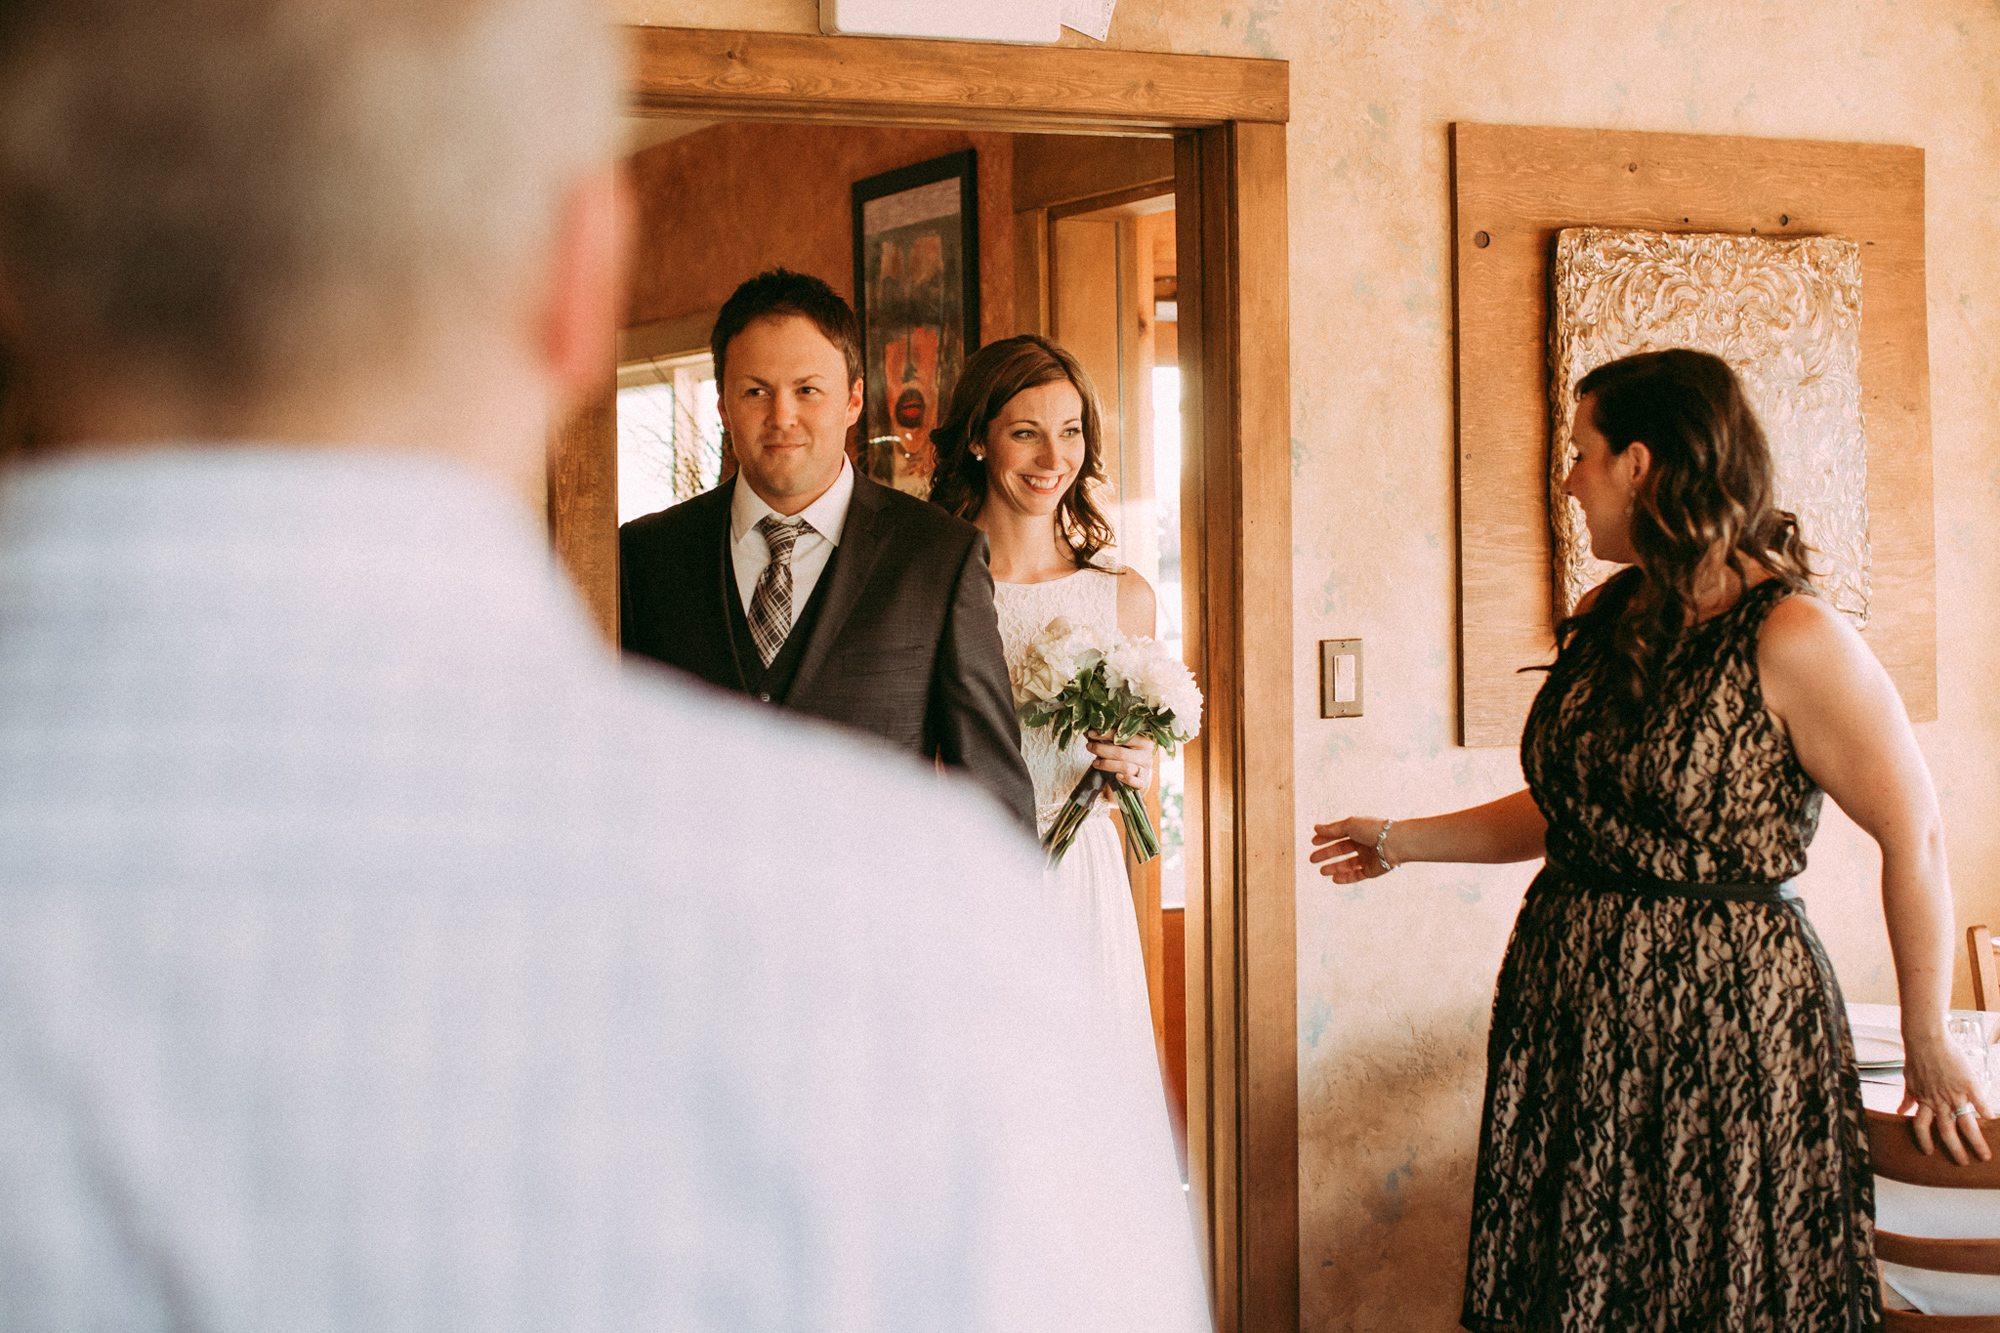 900-vancouver-elopement-photographer